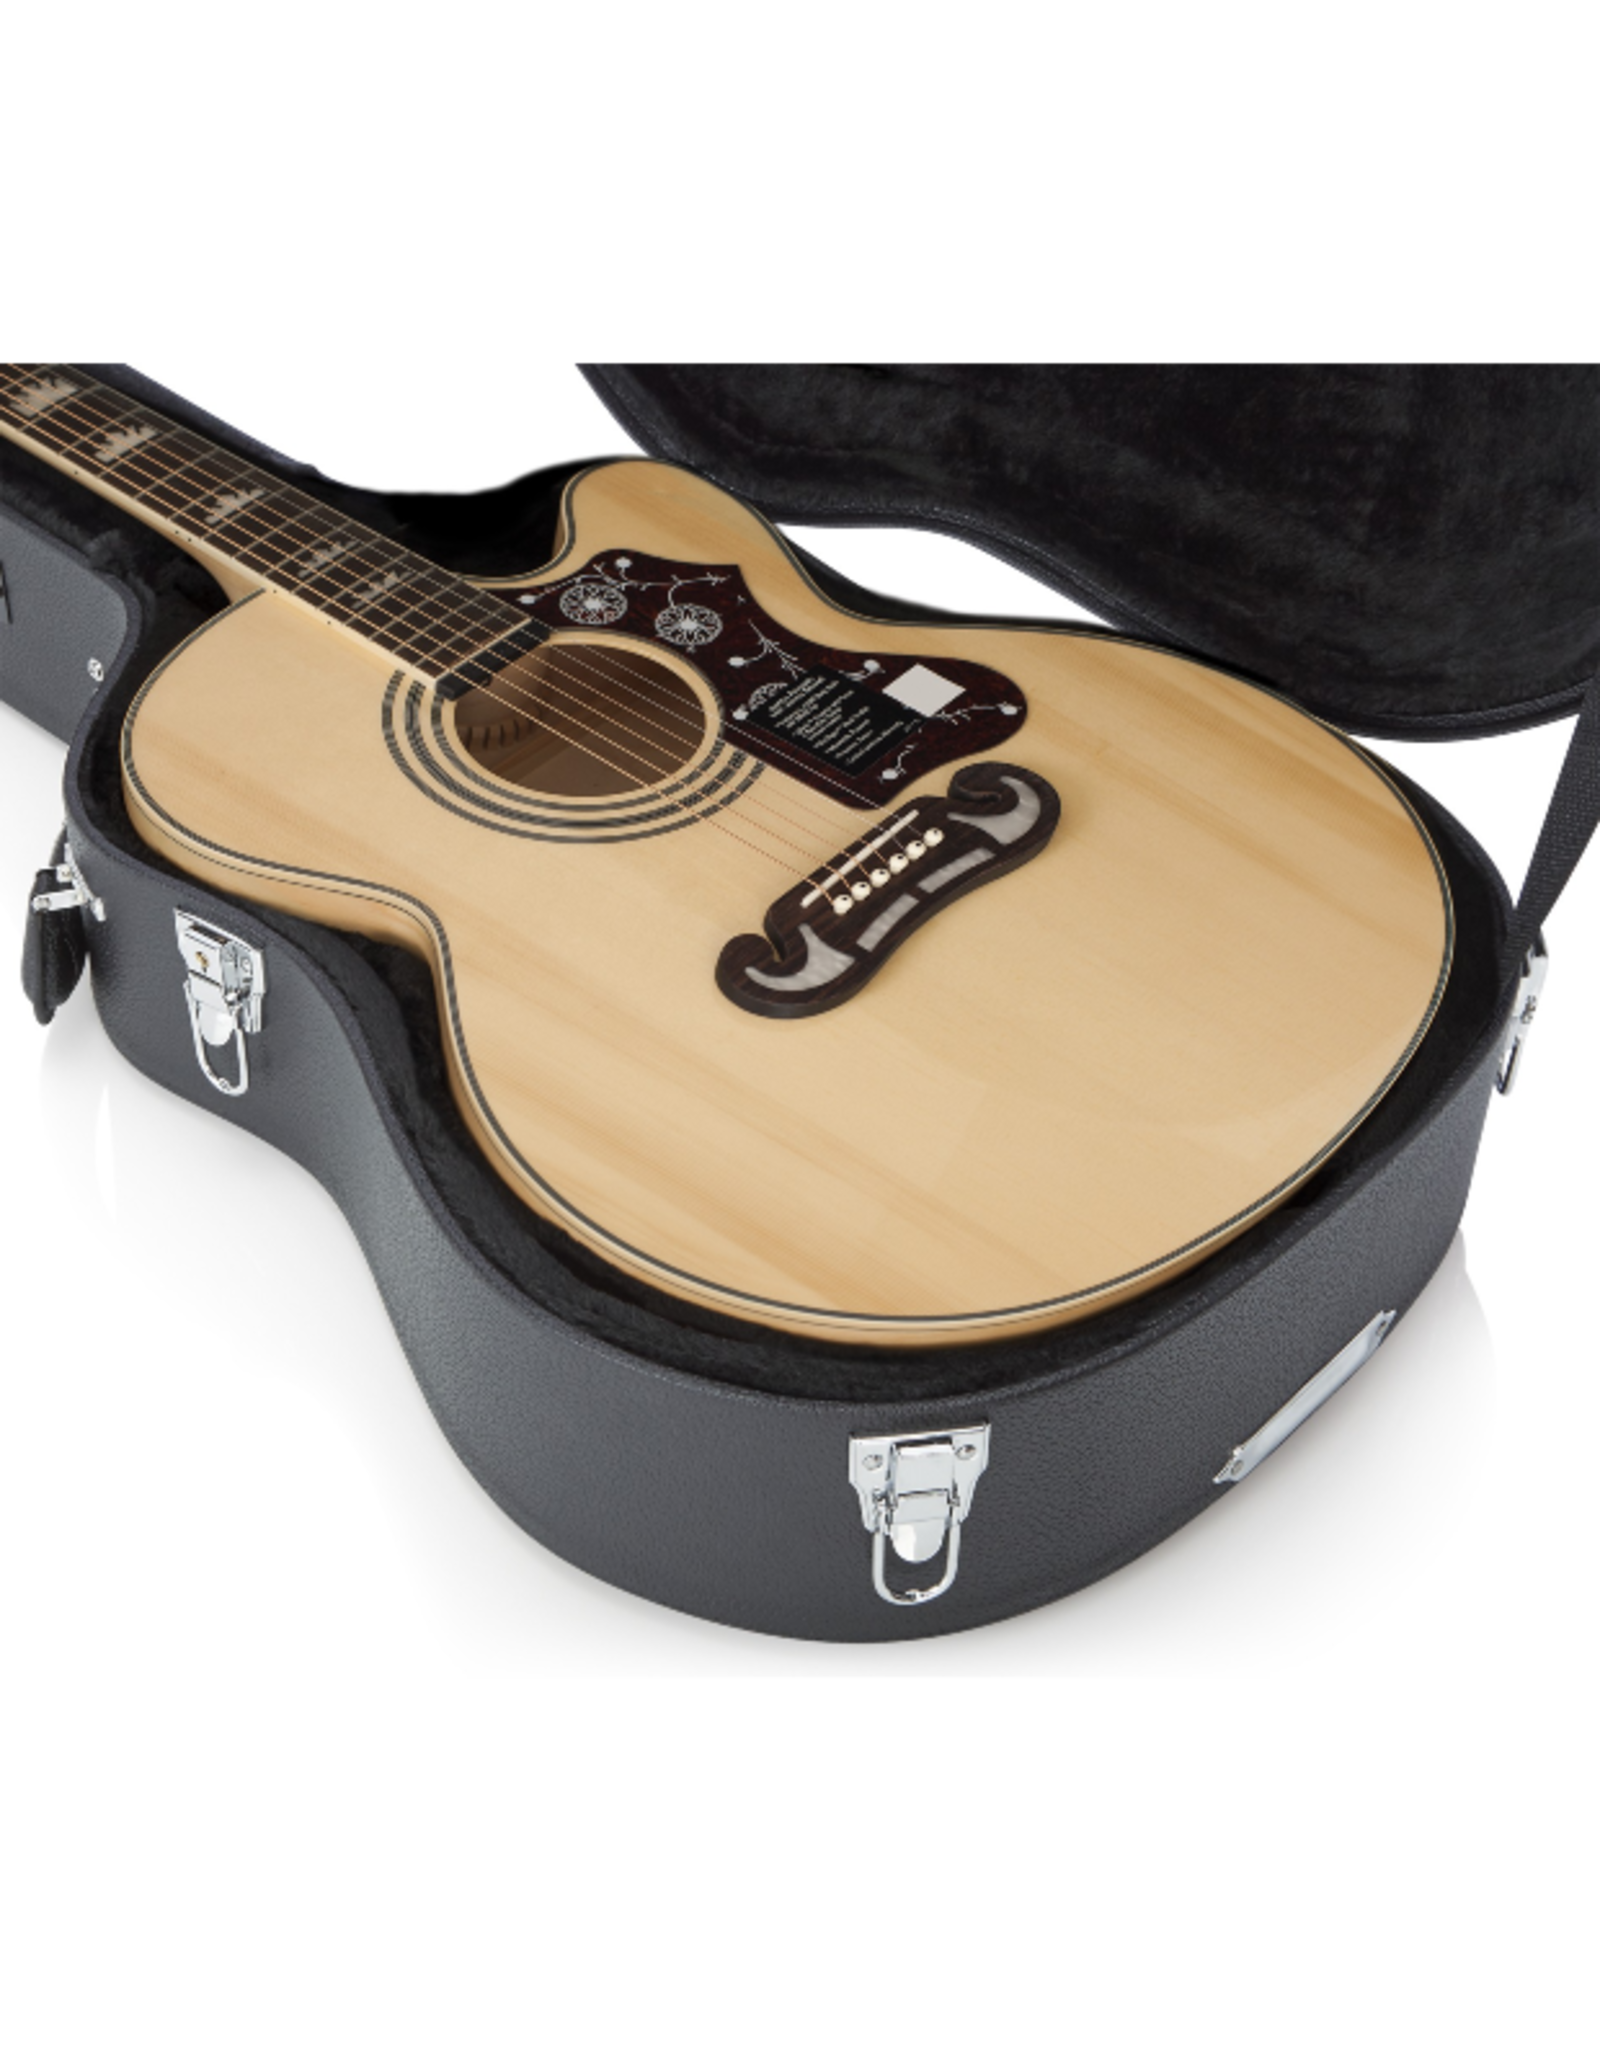 Gator Gator GW-JUMBO Deluxe Wood Jumbo Acoustic Guitar Case